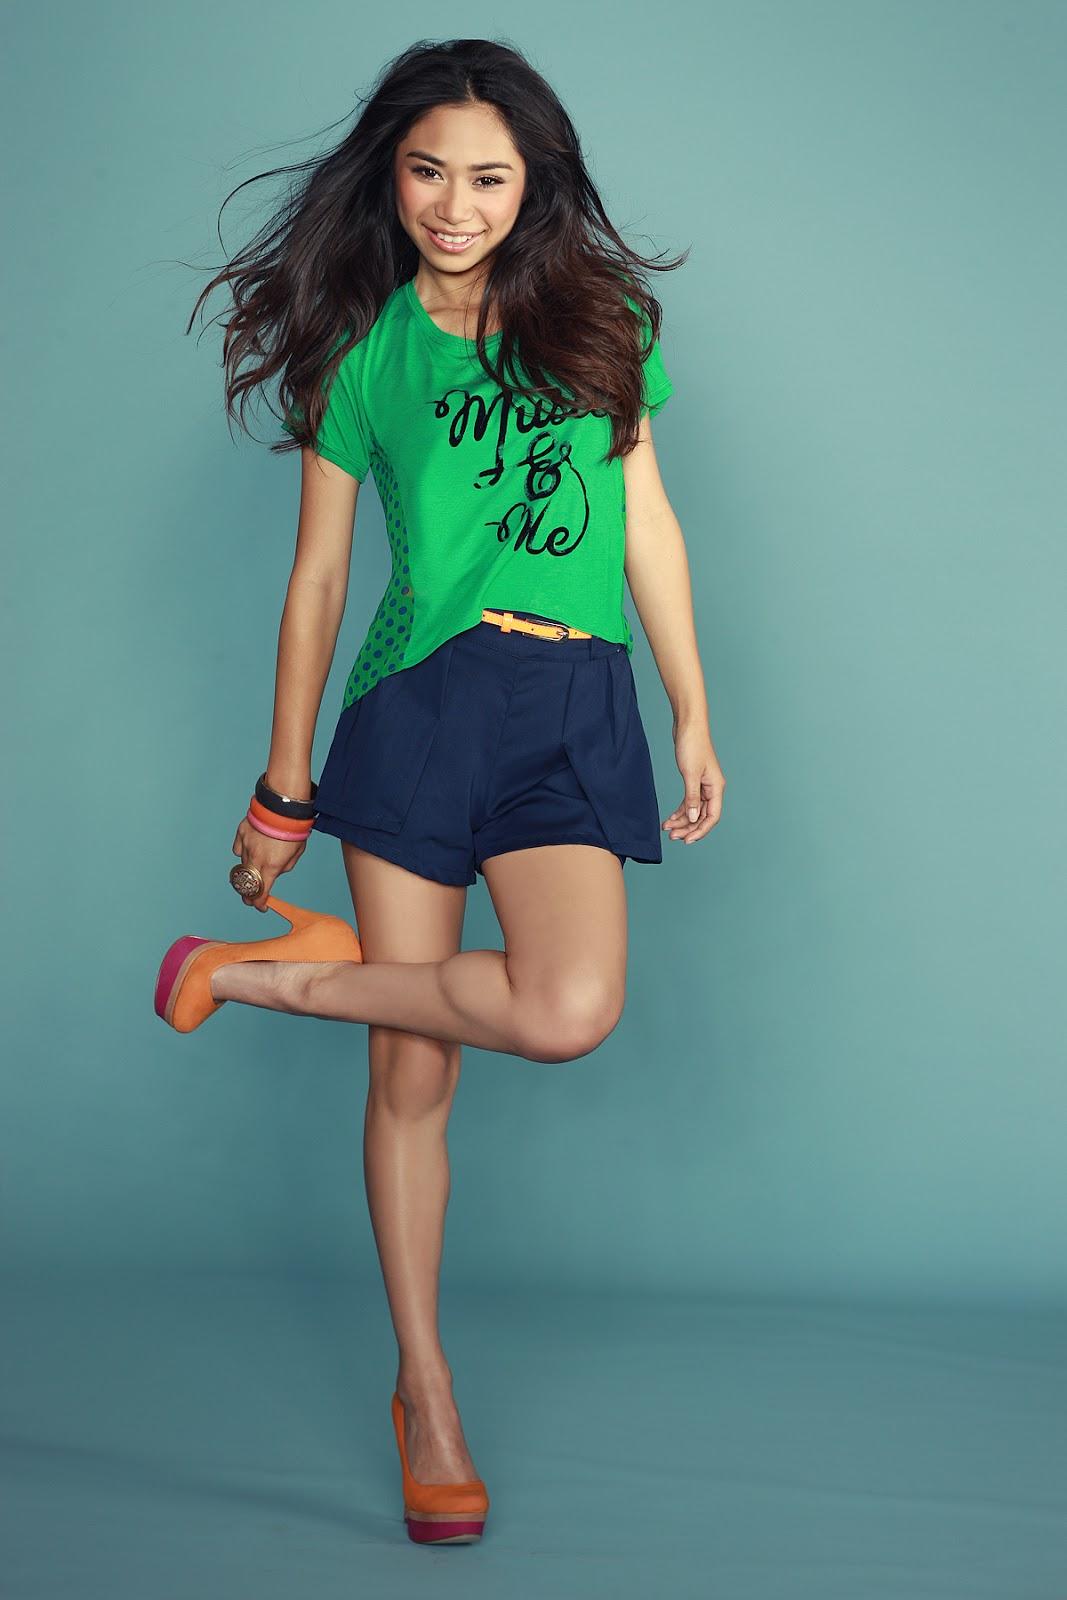 Shopgirl Jen Jessica Sanchez As Global Benchsetter